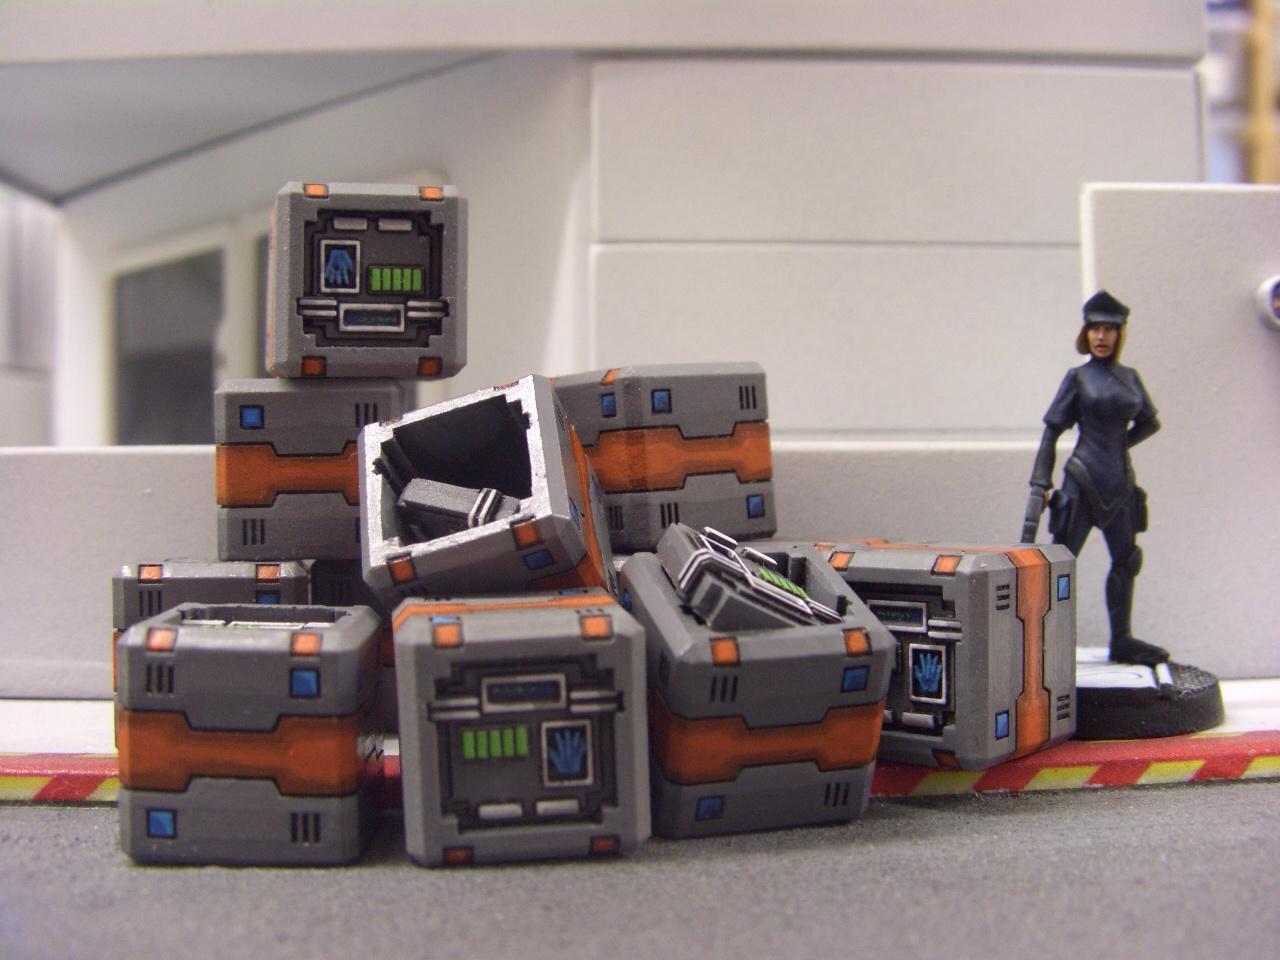 Terrain, secure crates